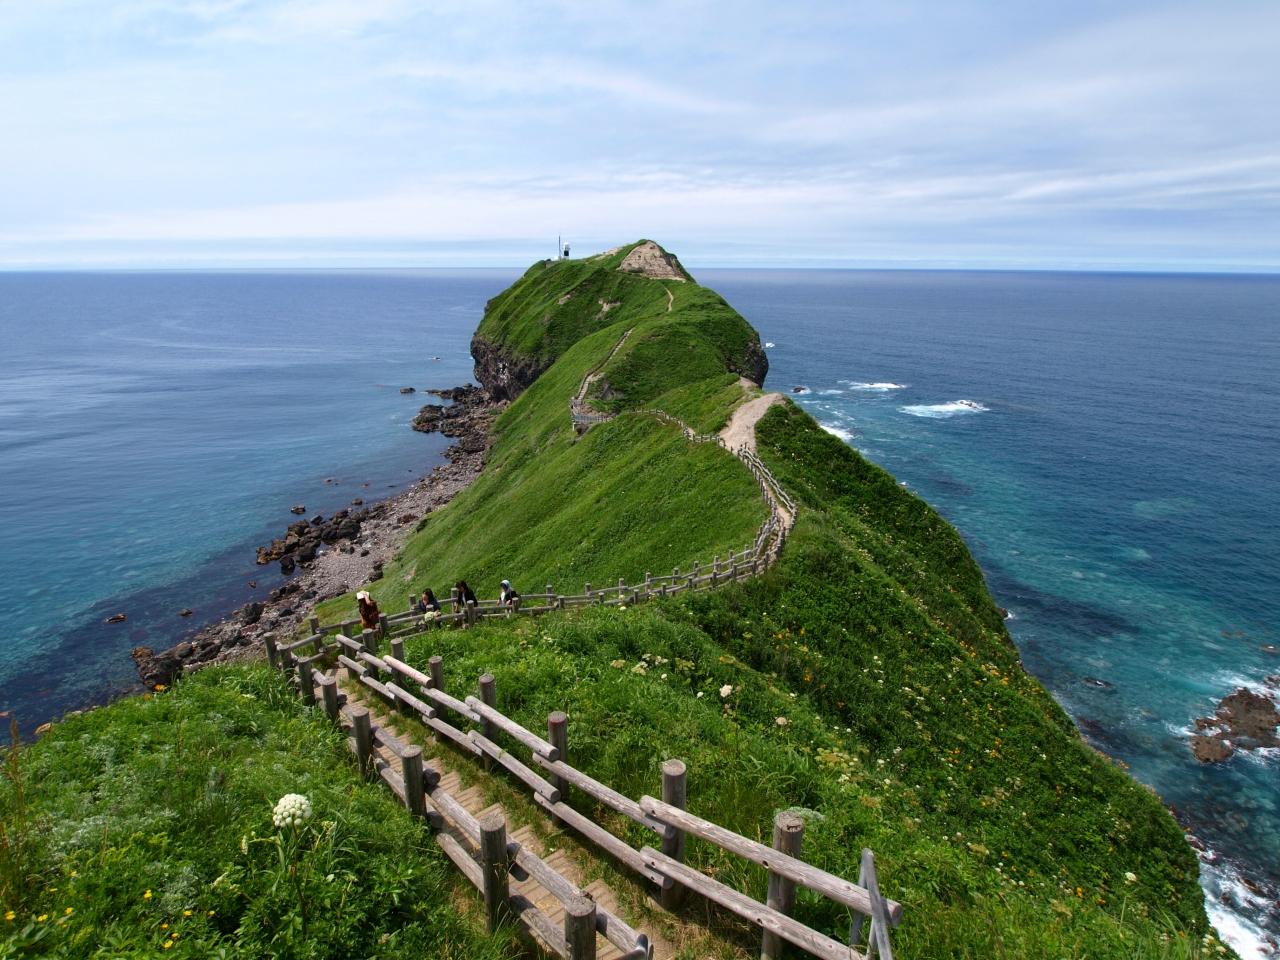 積丹半島 - Shakotan Peninsula - JapaneseClass.jp